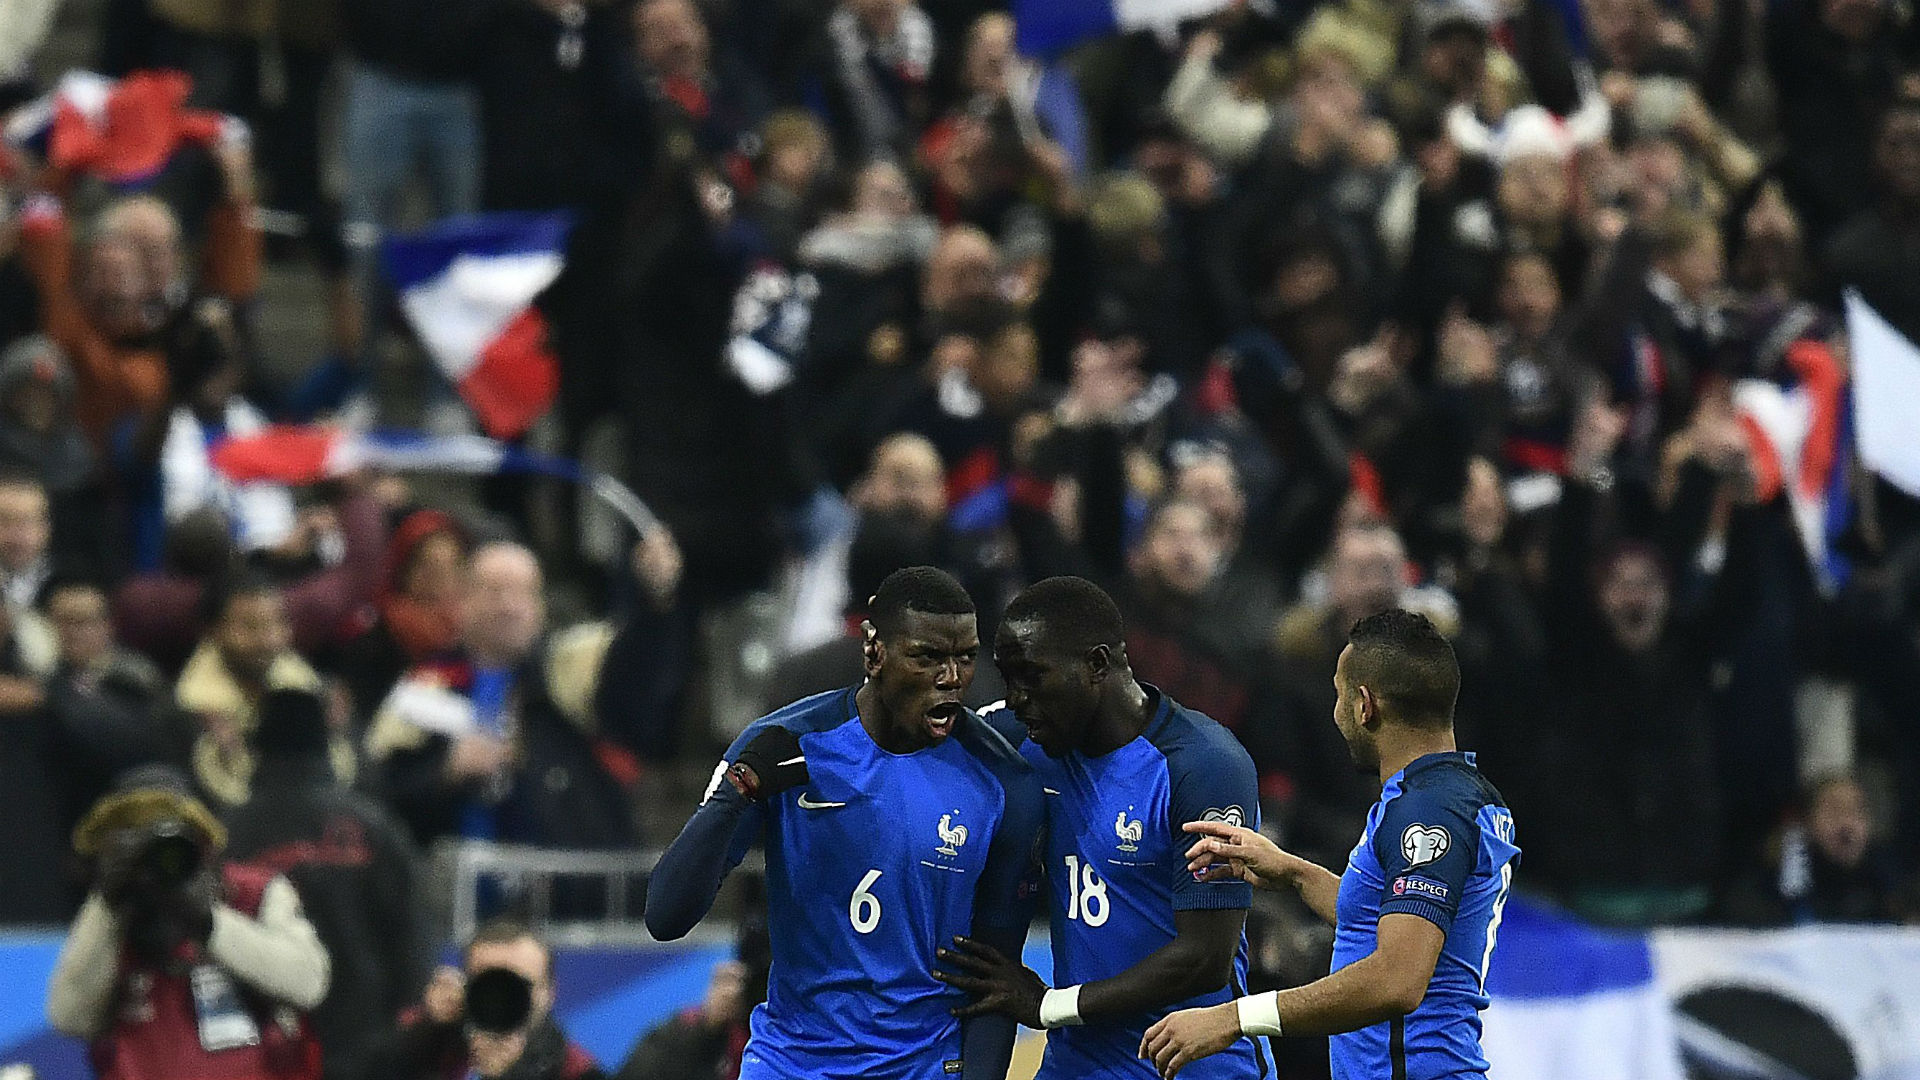 France 2-1 Sweden: Pogba and Payet inspire Les Bleus comeback